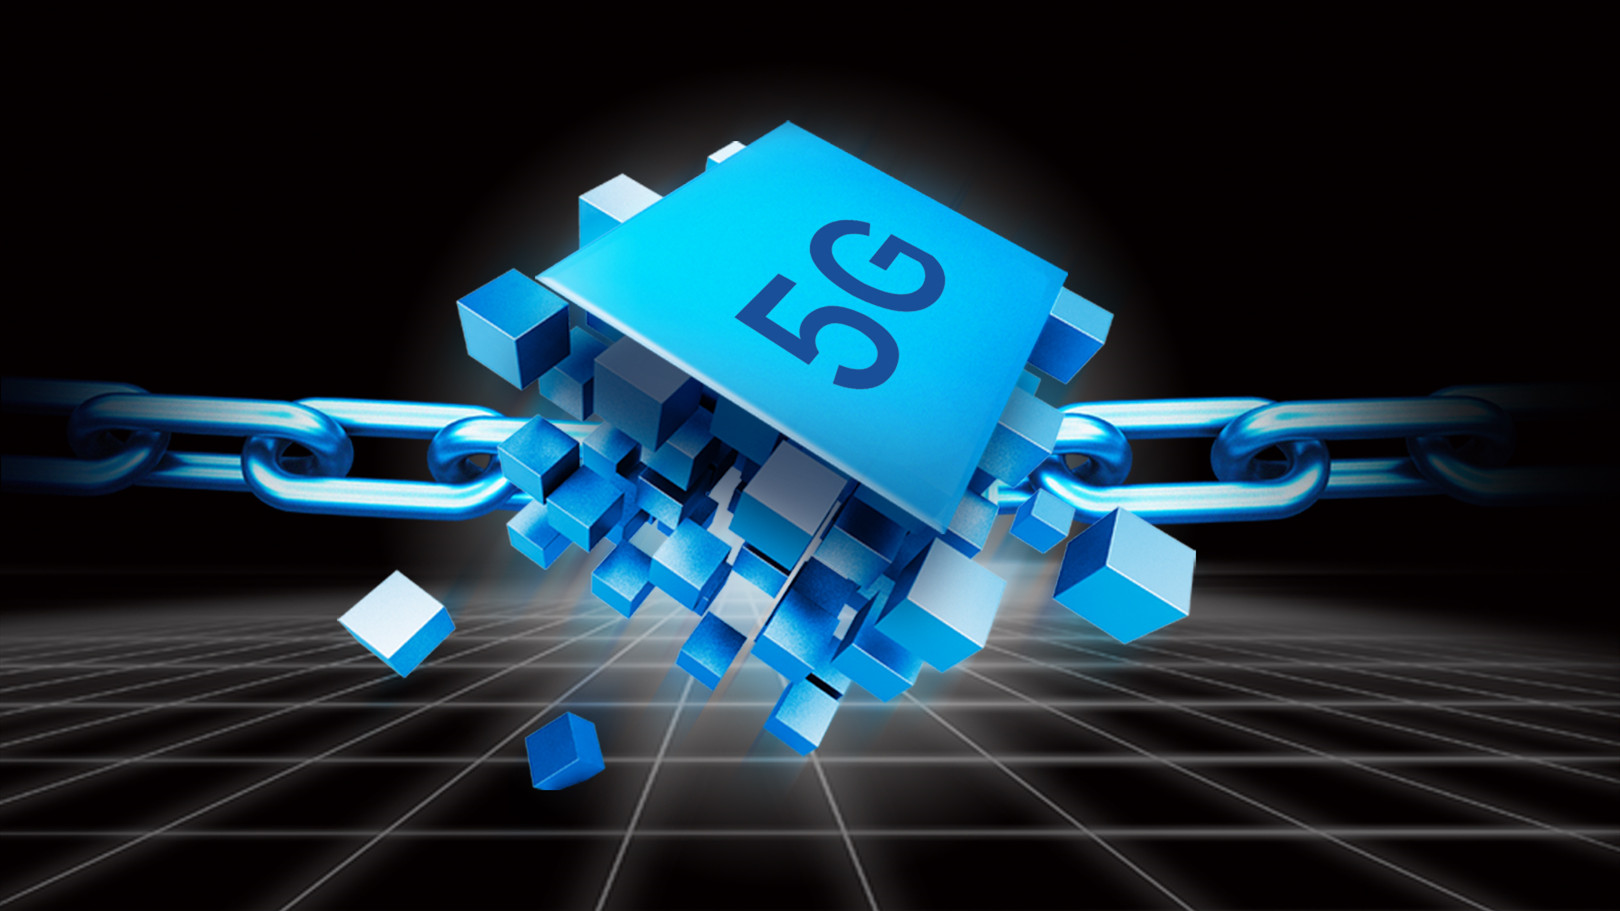 5G落地望催生巨大应用市场,细分领域龙头分享行业盛宴